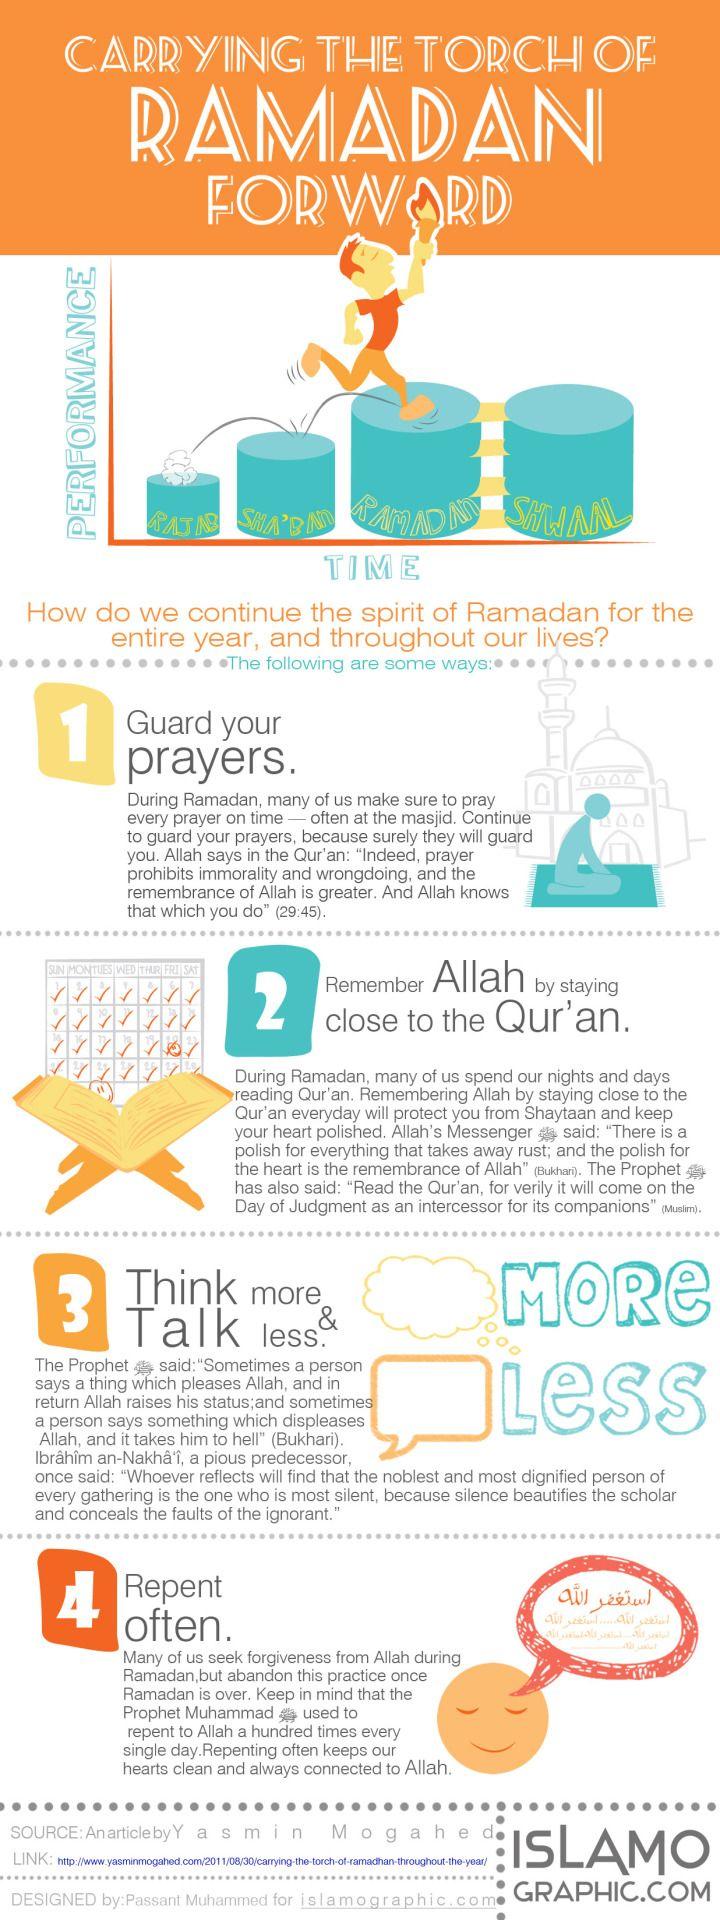 Islamic Education through Infographics -- Islamographic.com